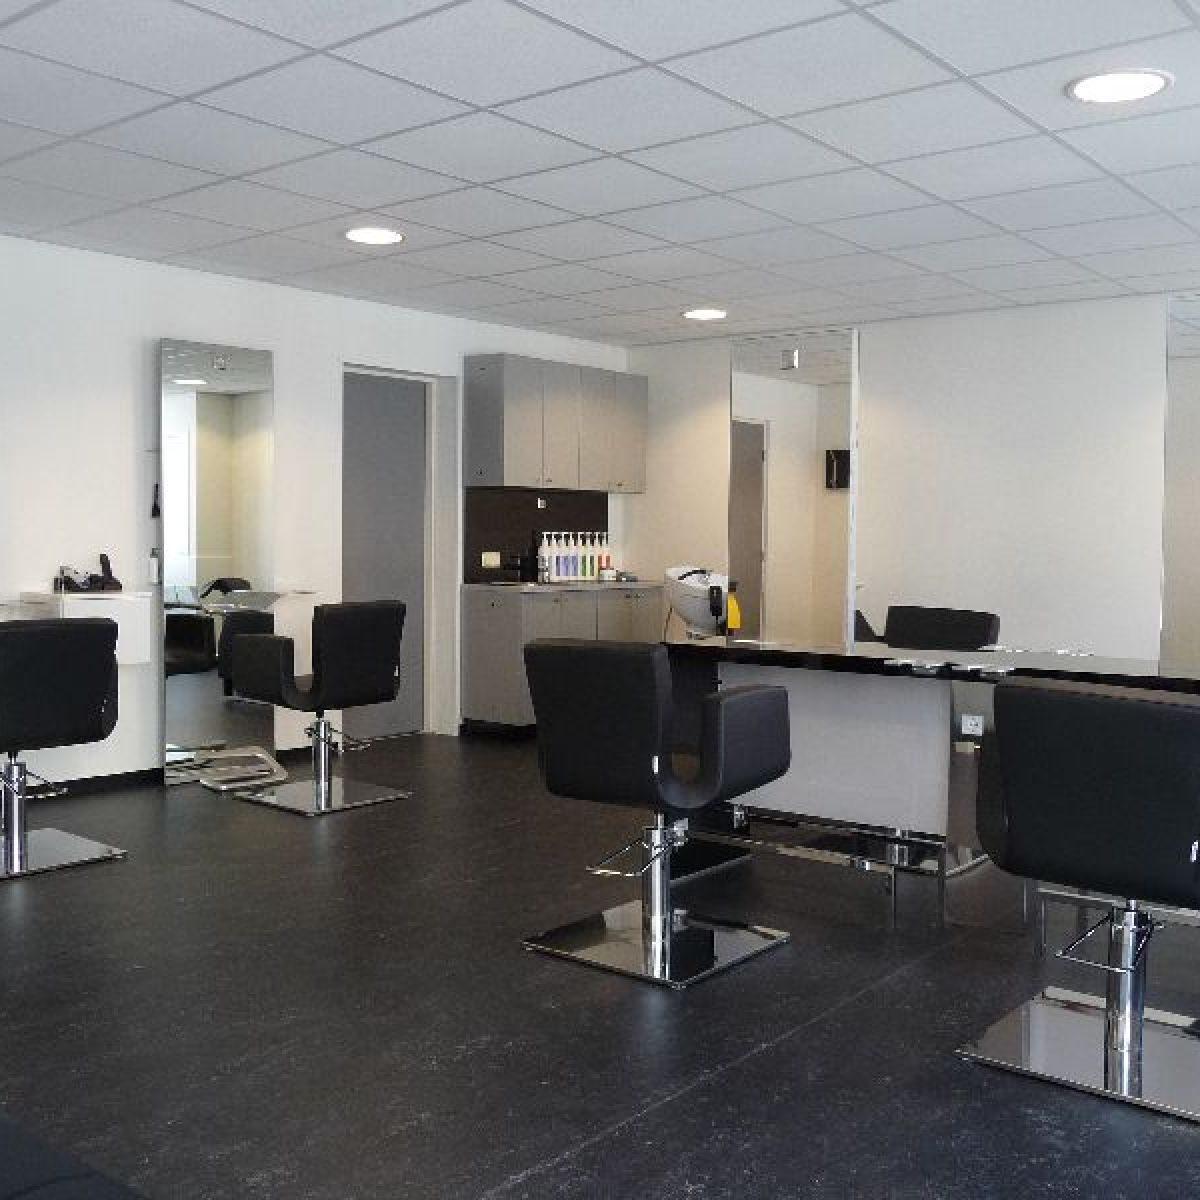 Nelson mobilier hair salon furniture made in france hair salon design hair salon interiors for Catalogue mobilier design